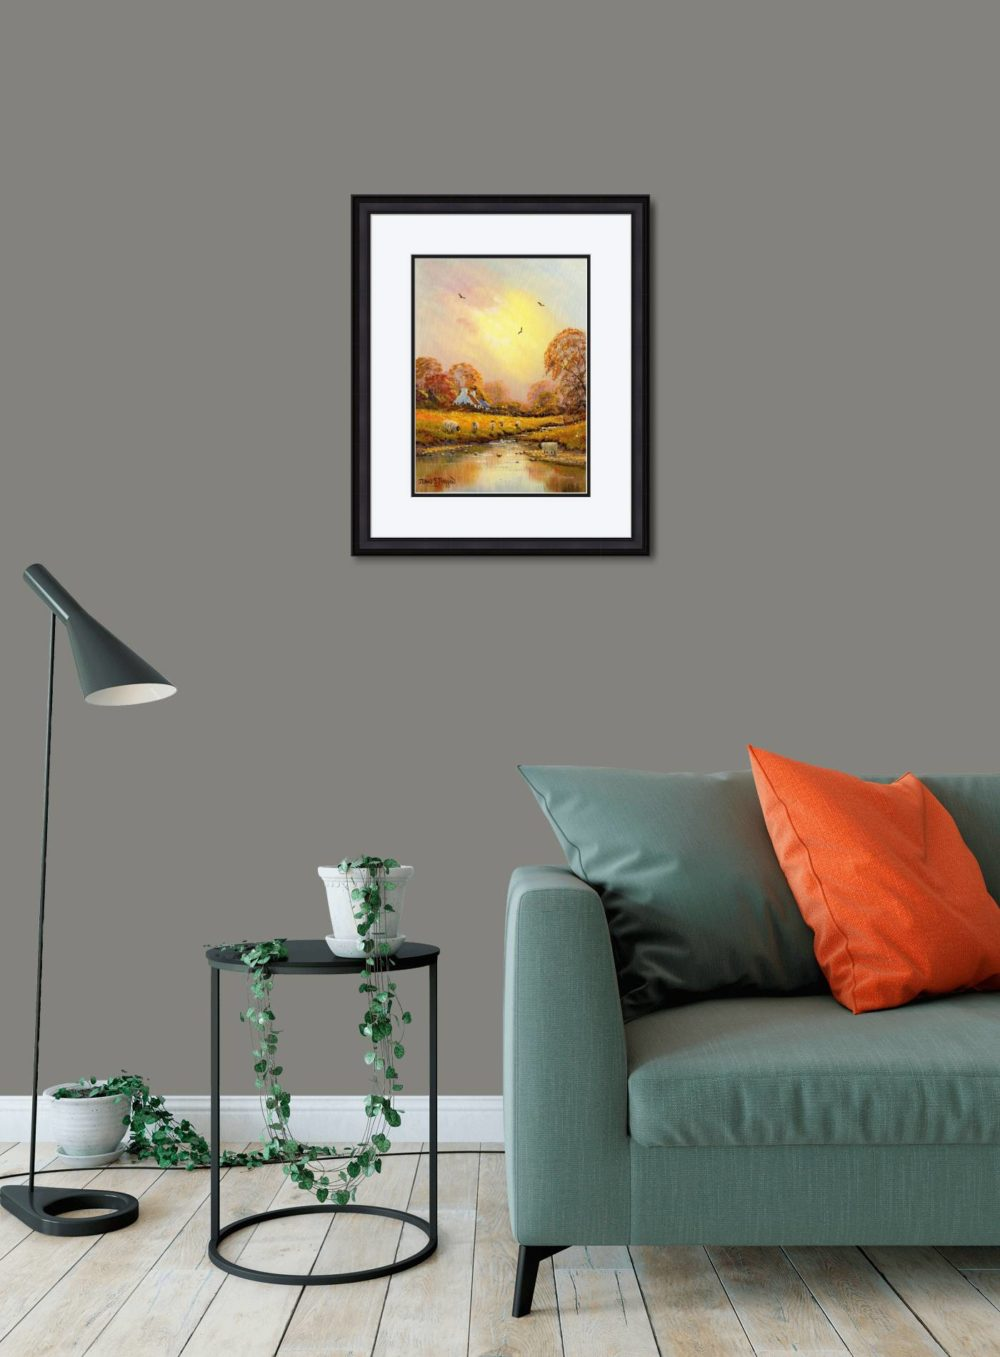 Autumn Stream Print (Medium) in Black Frame in Room